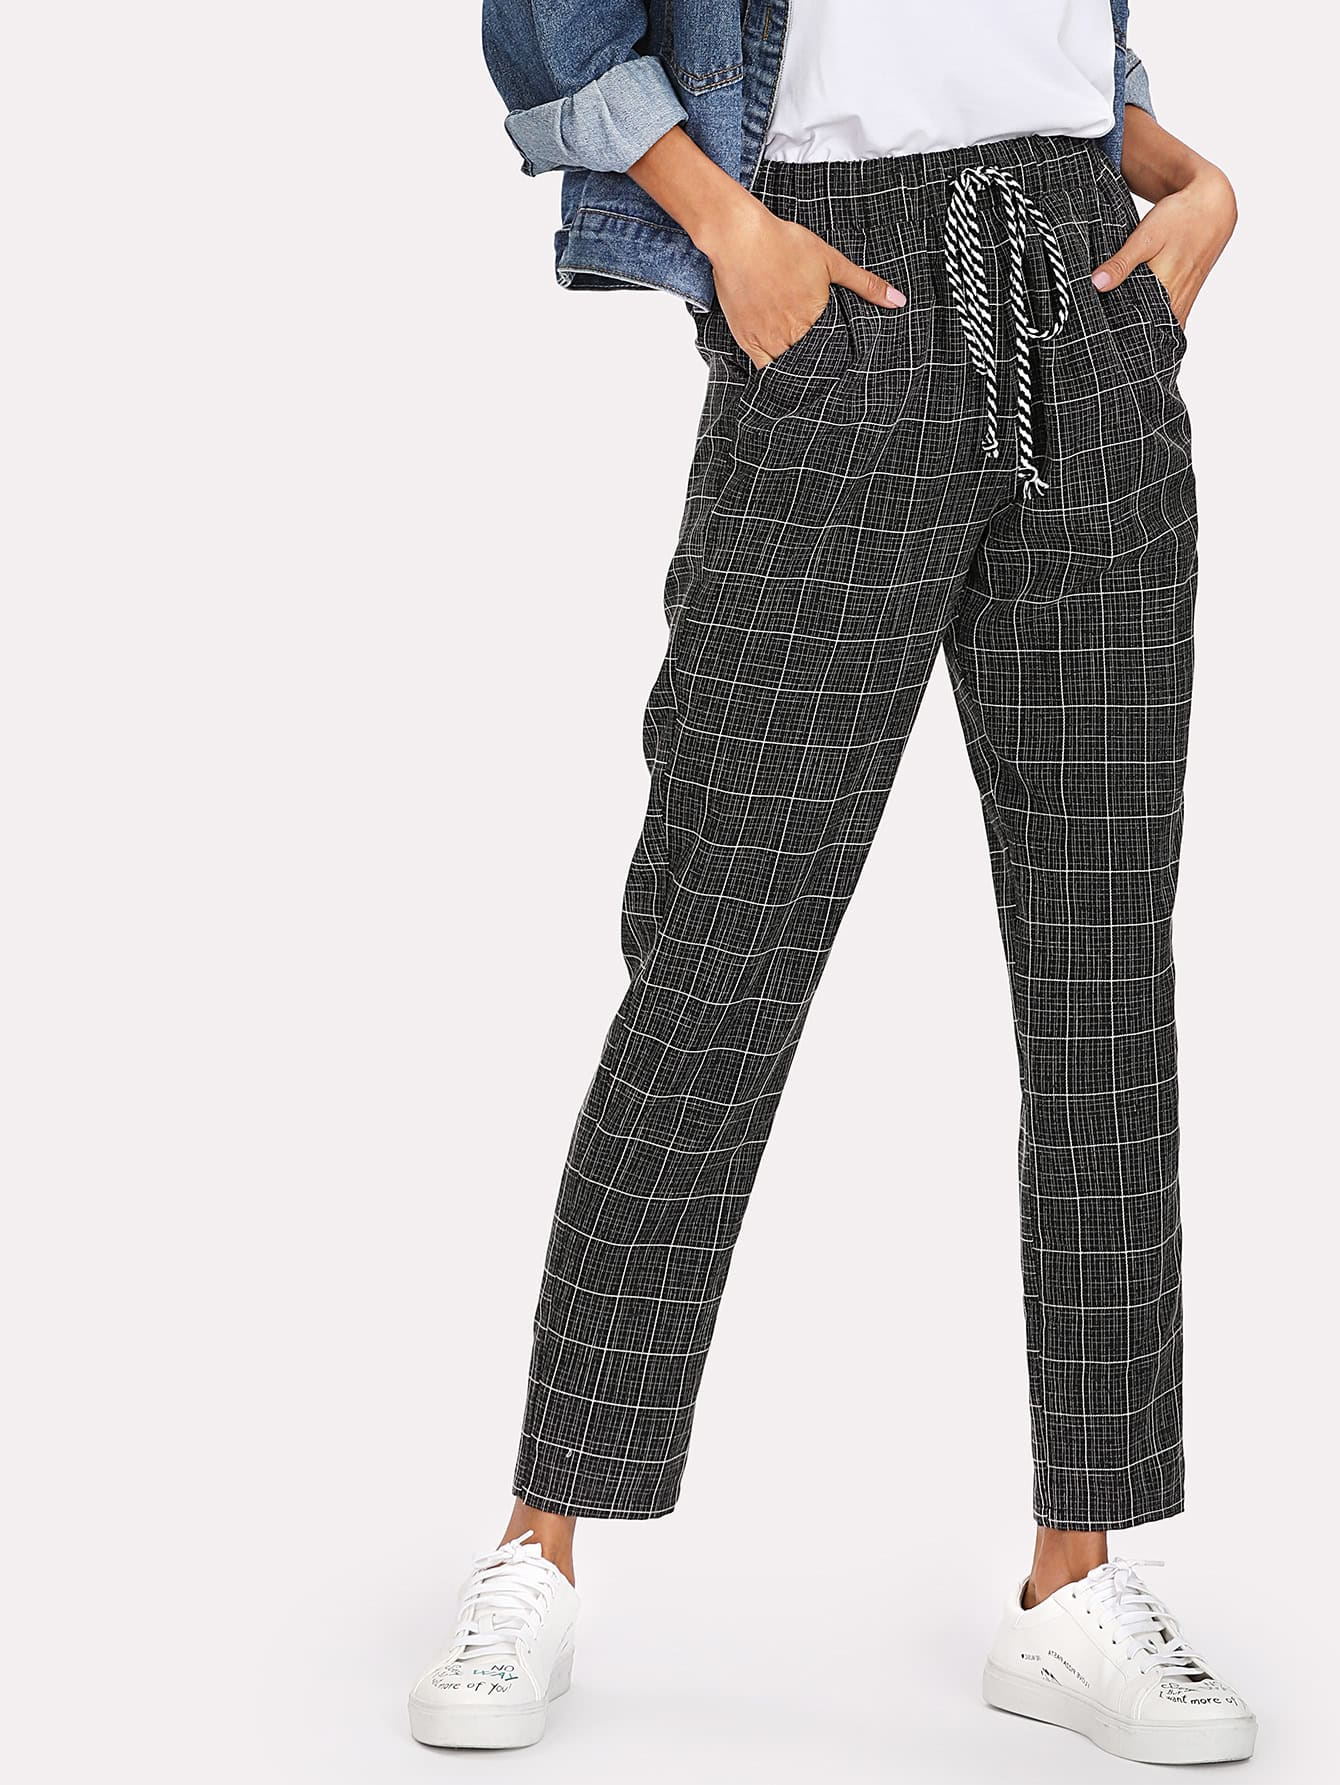 Pocket Side Grid Peg Pants grid carrot pants